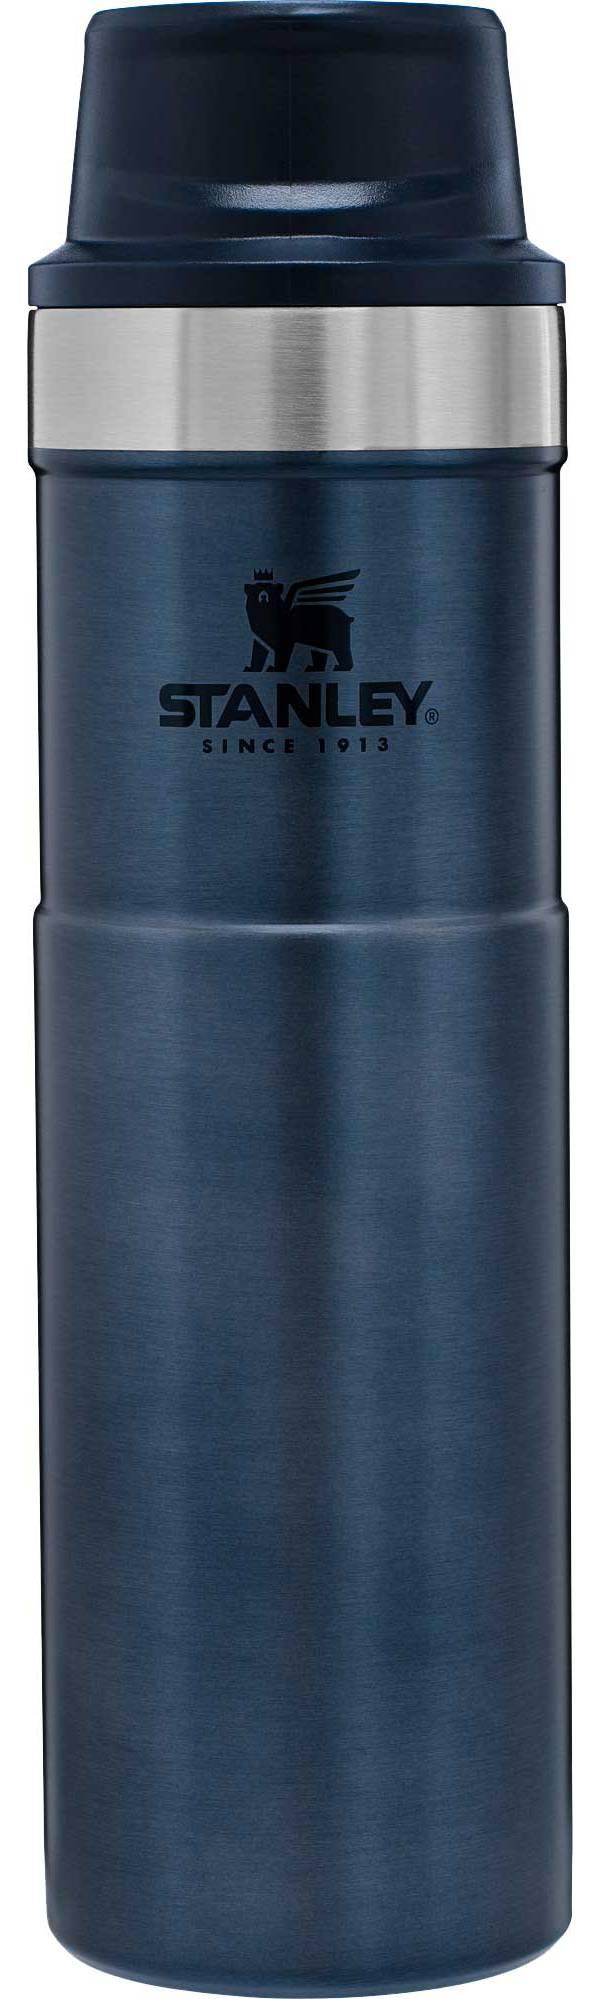 Stanley Trigger Action 20 oz. Vacuum Mug product image